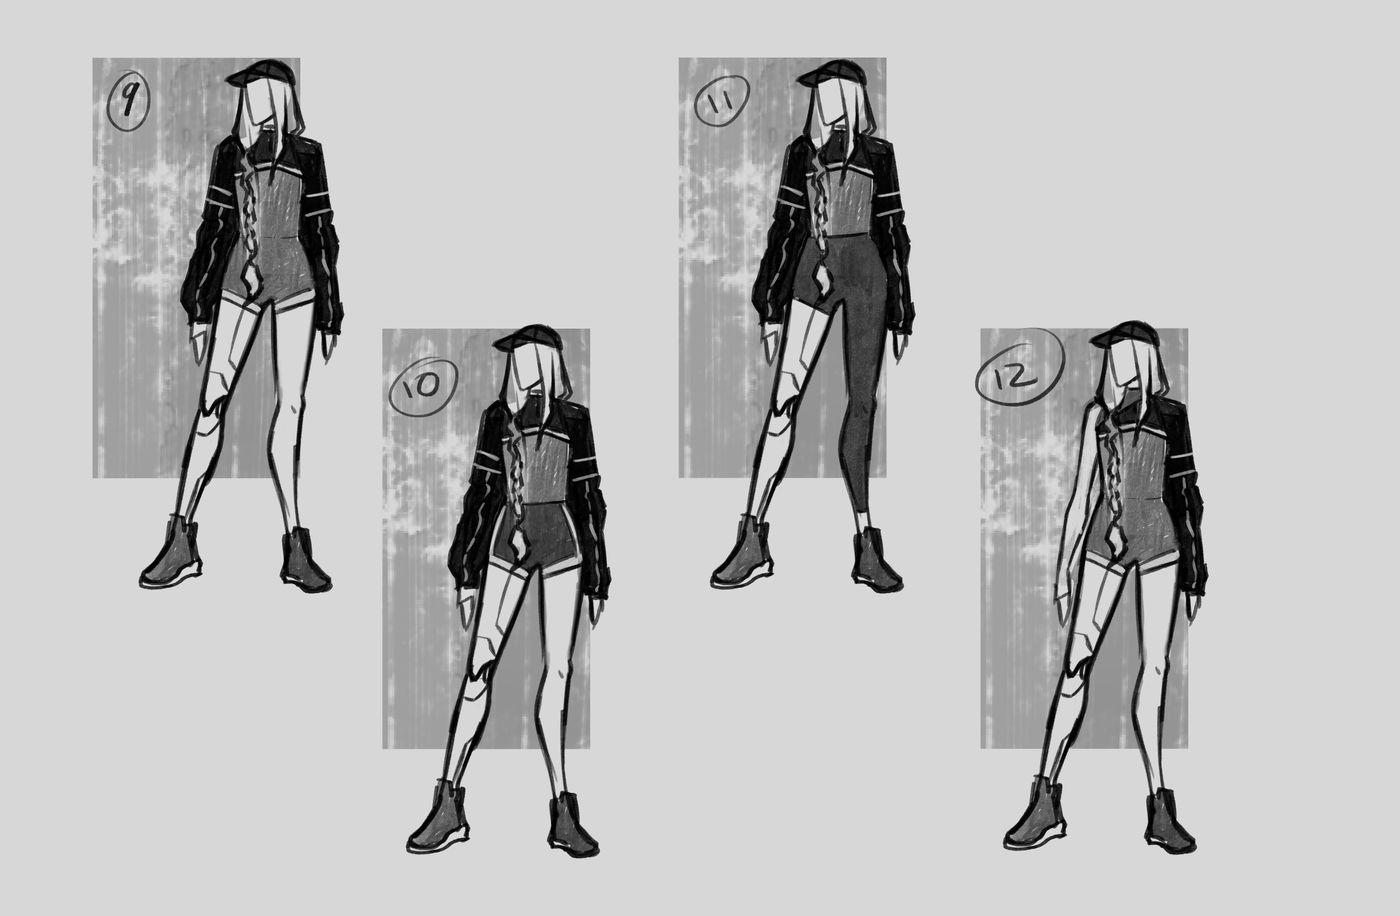 Steer Jasmine %20 Scme3420 Rookies %20 Character Design Thumbnails03 Jasminesteer